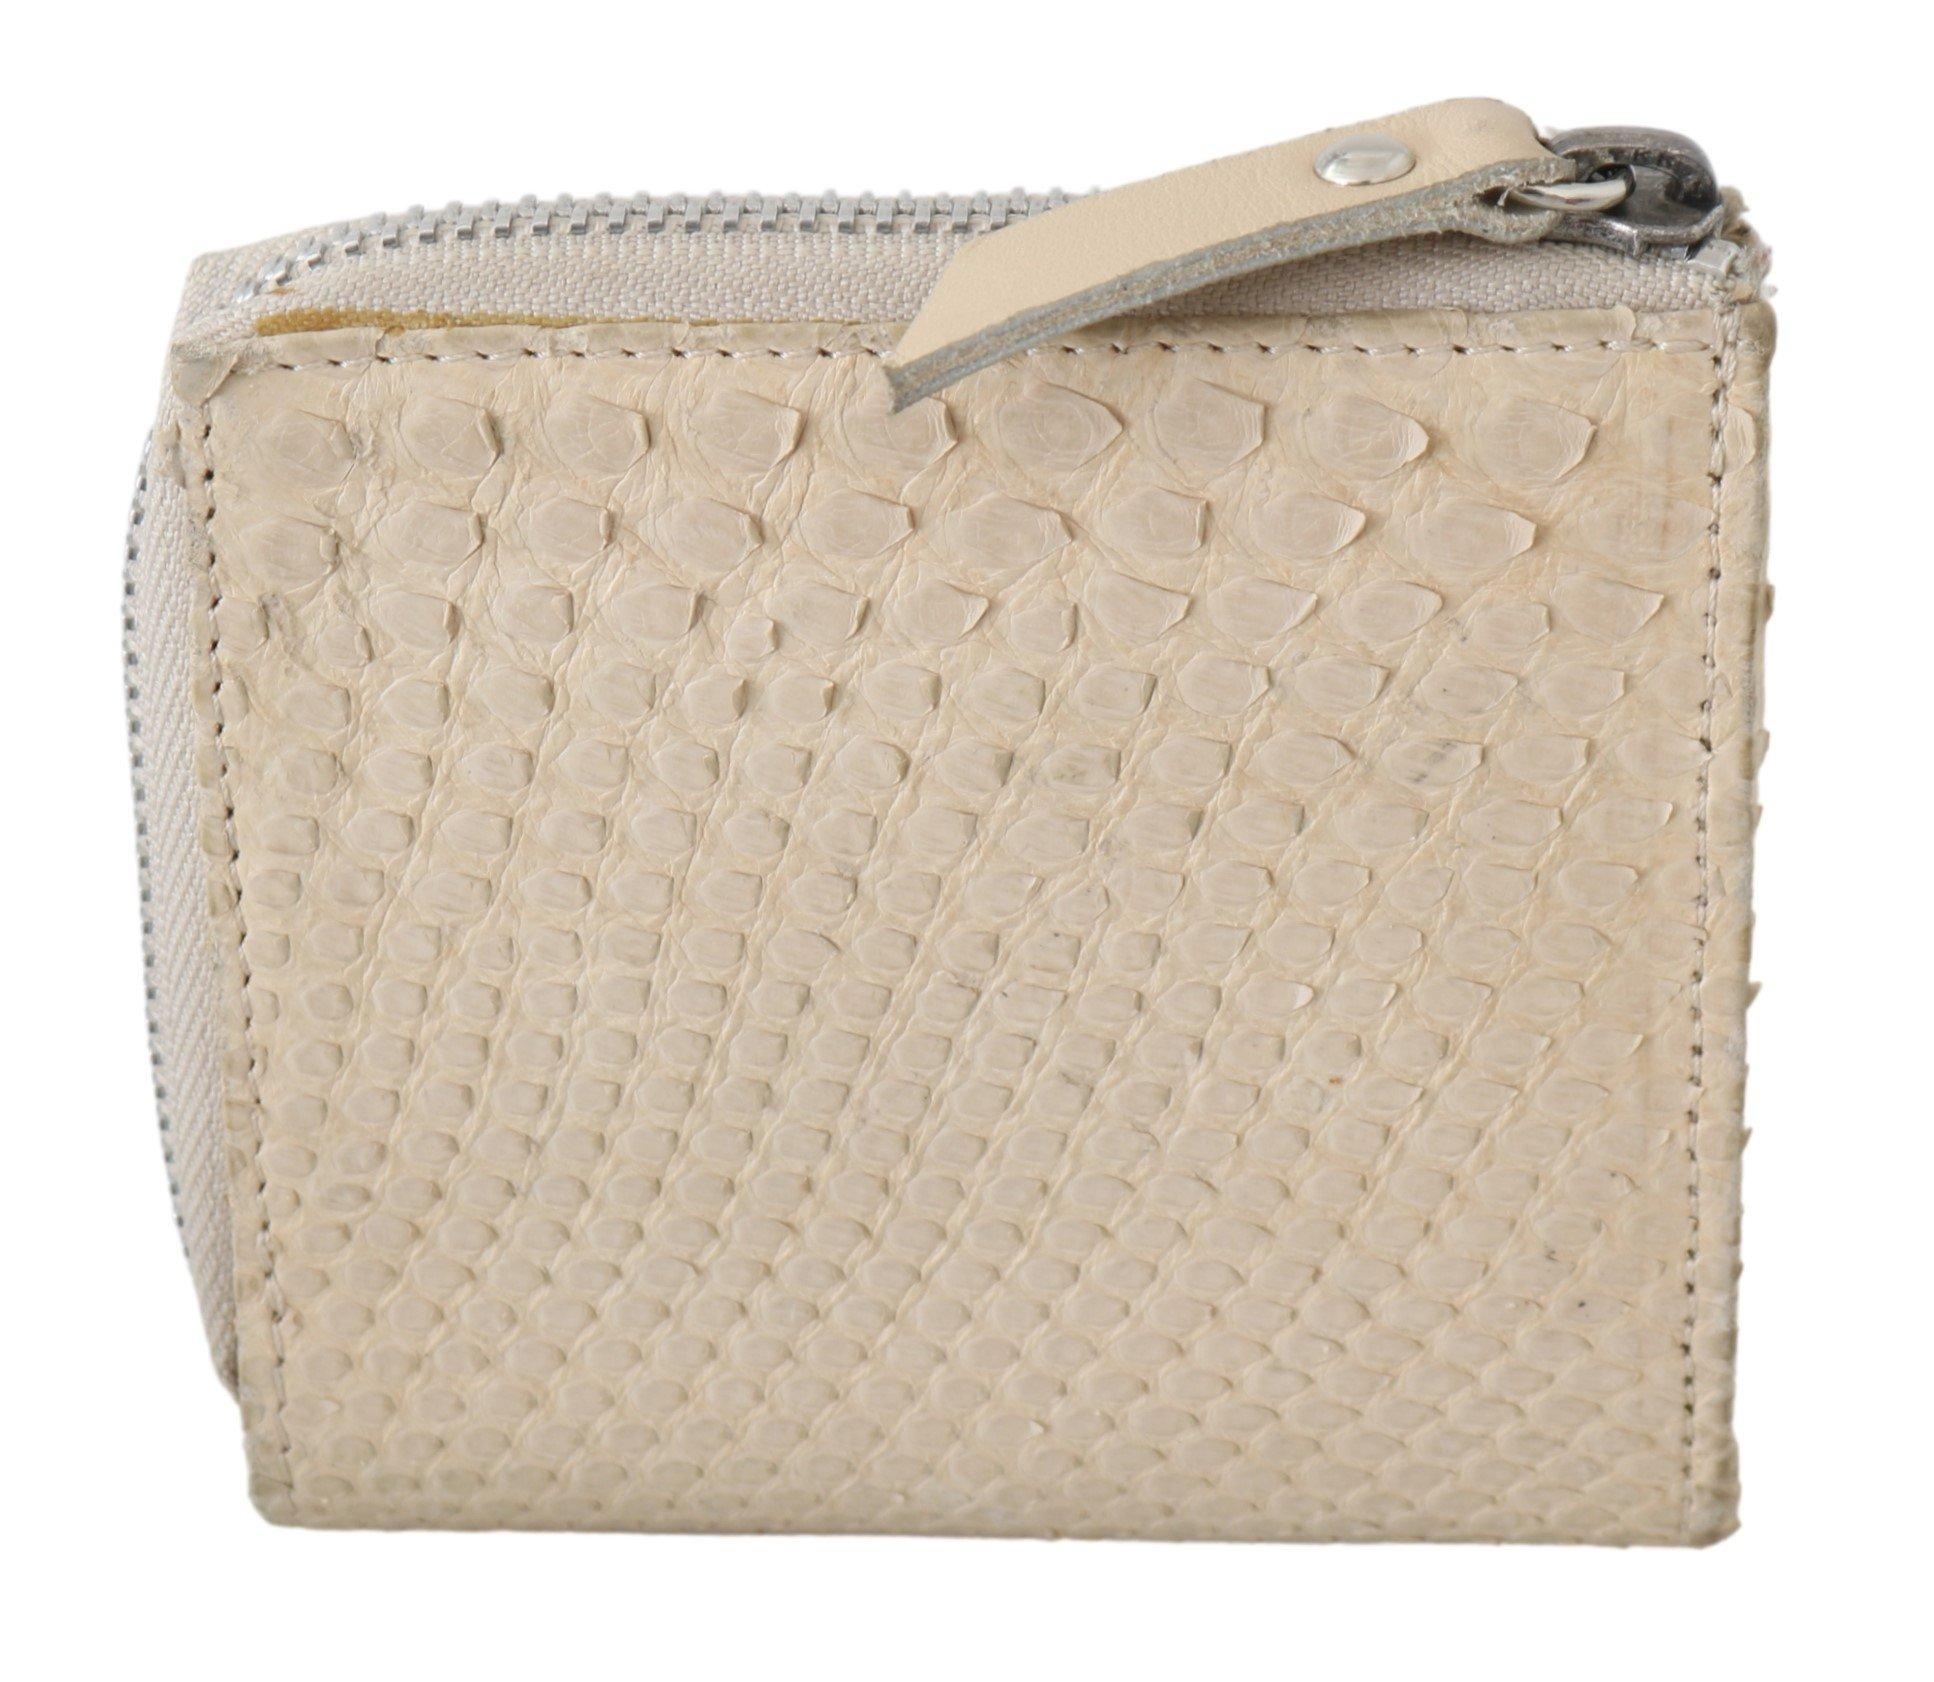 GF Ferre Women's Mutlfunctional Zipper Coin Purse Wallet Pink VAS9132